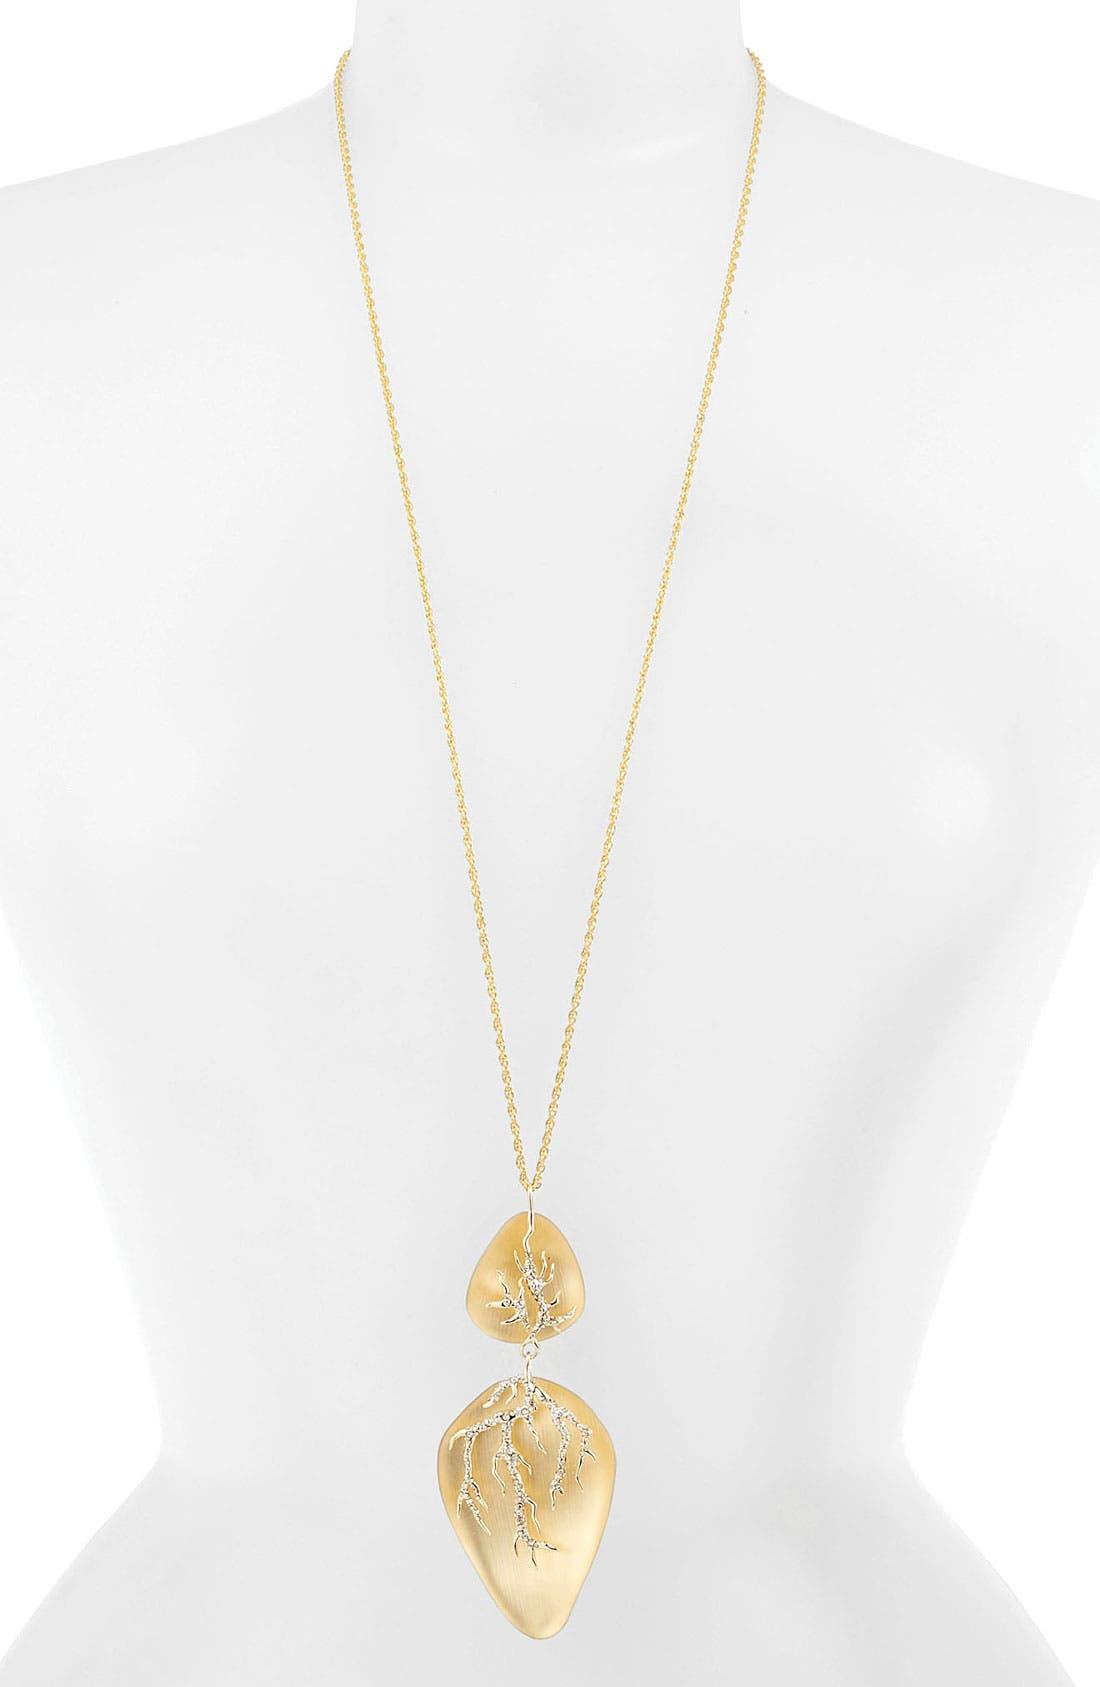 Main Image - Alexis Bittar 'Ophelia' Long Pendant Necklace